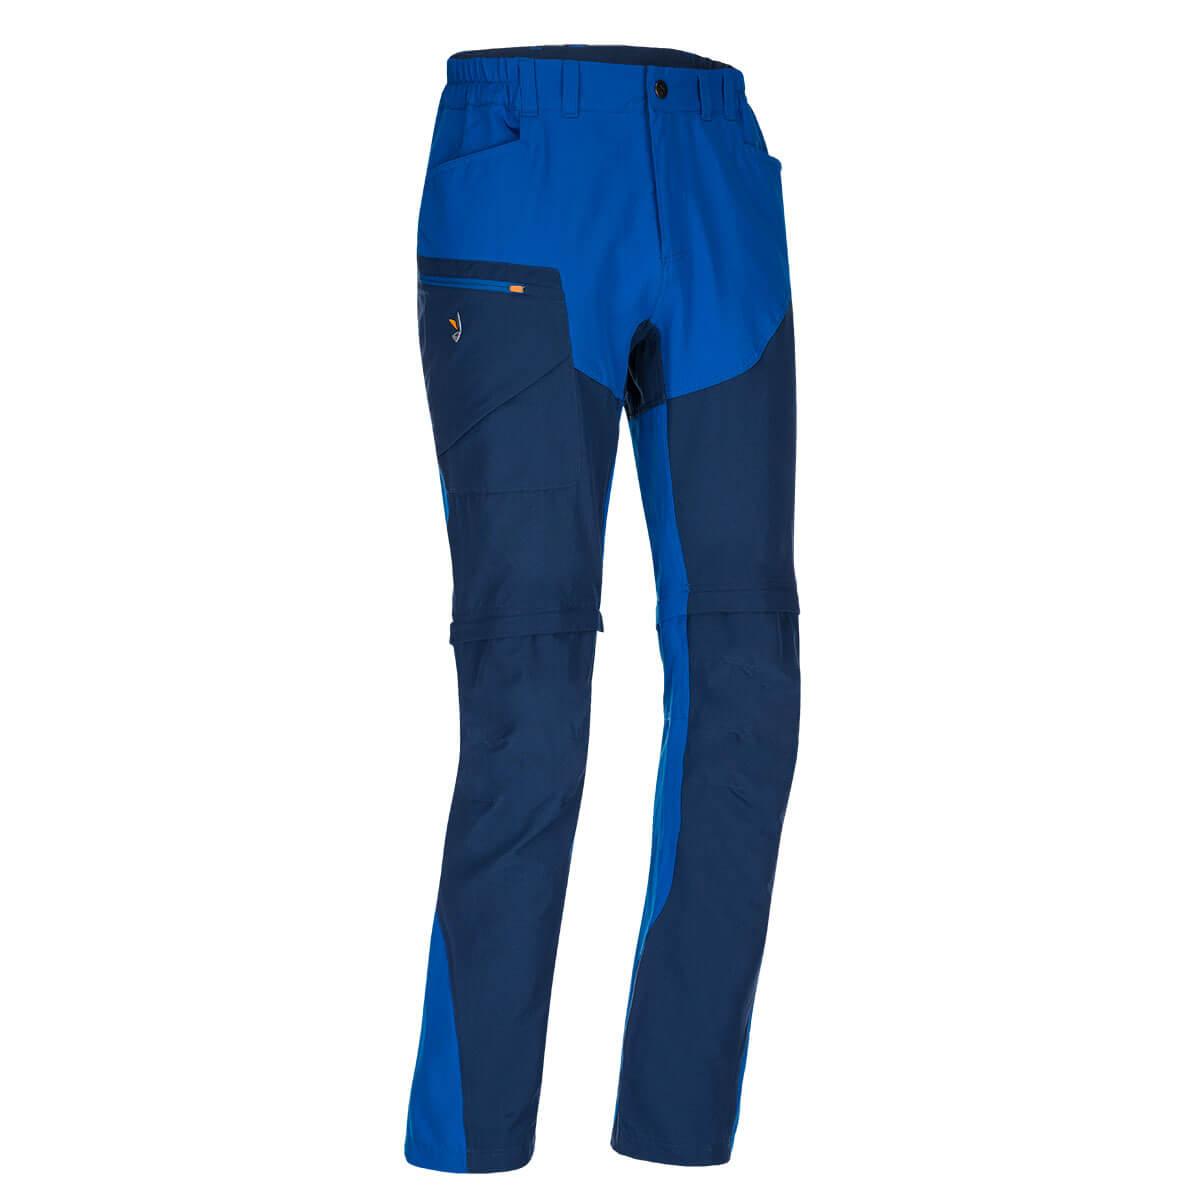 Nohavice Zajo Magnet Neo Zip Off Pants Nautical Blue - veľkosť M